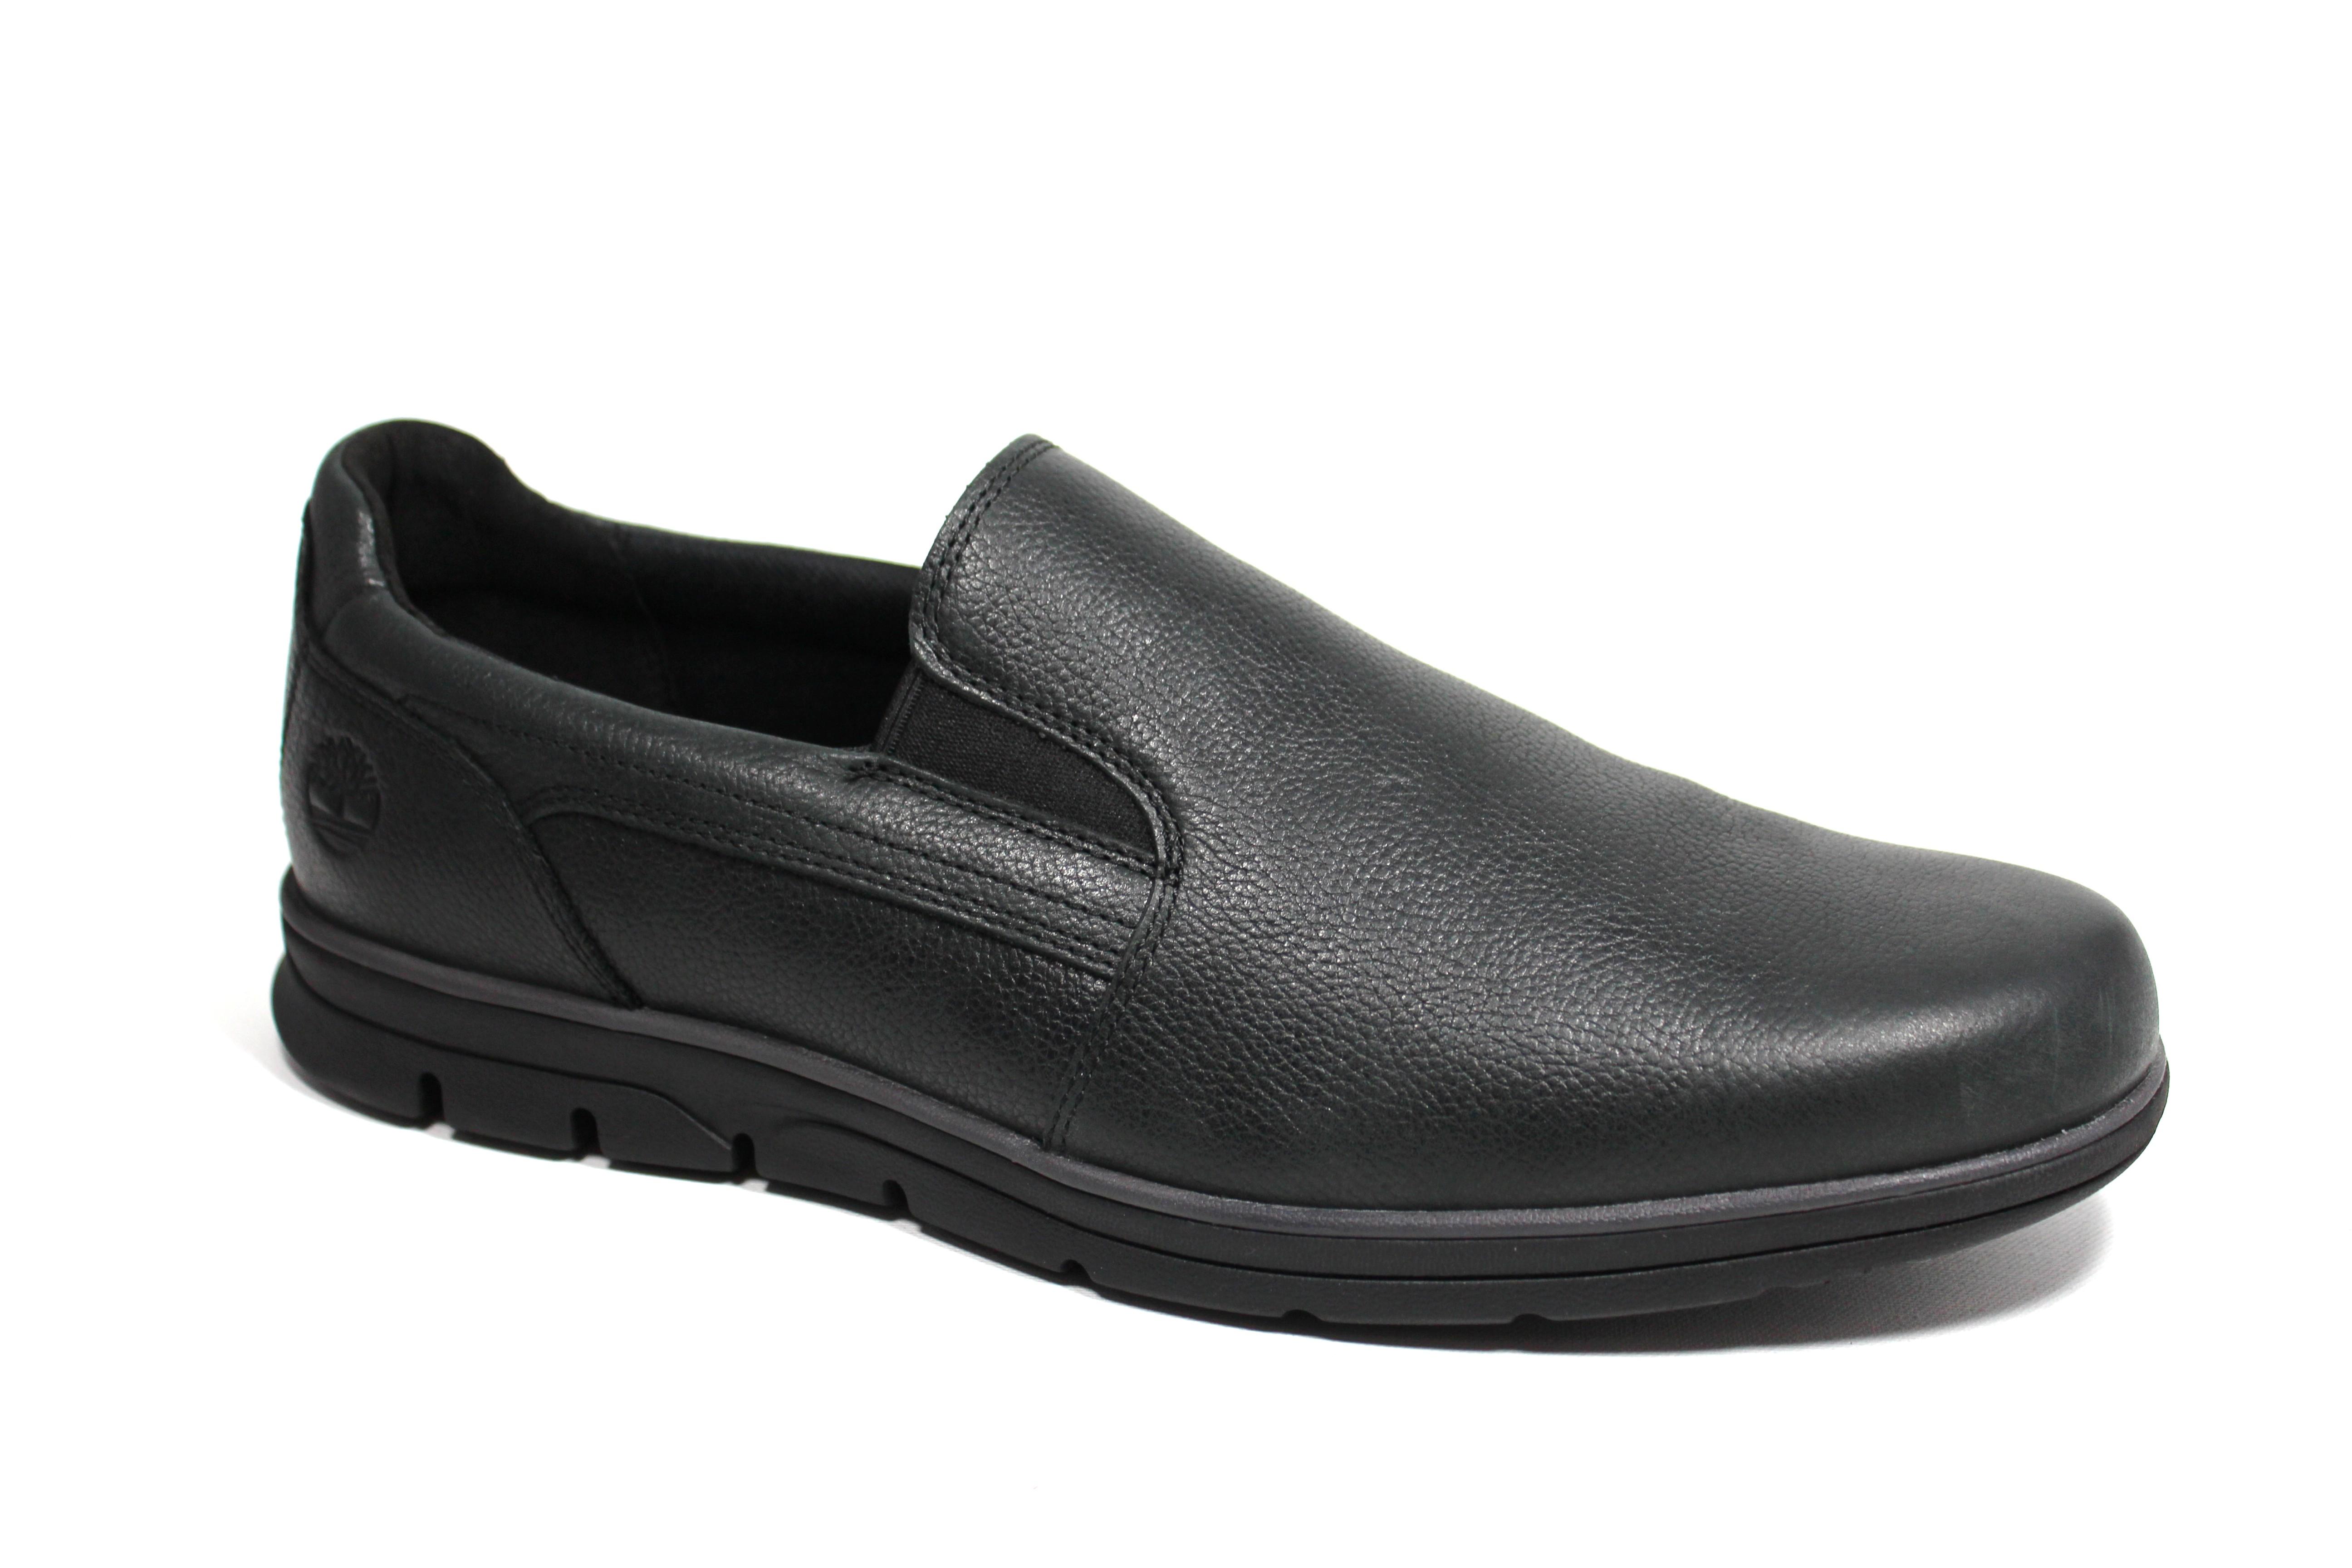 toscanini schuhe in ber und untergr en sportiver slipper 14002004 t a1joj. Black Bedroom Furniture Sets. Home Design Ideas